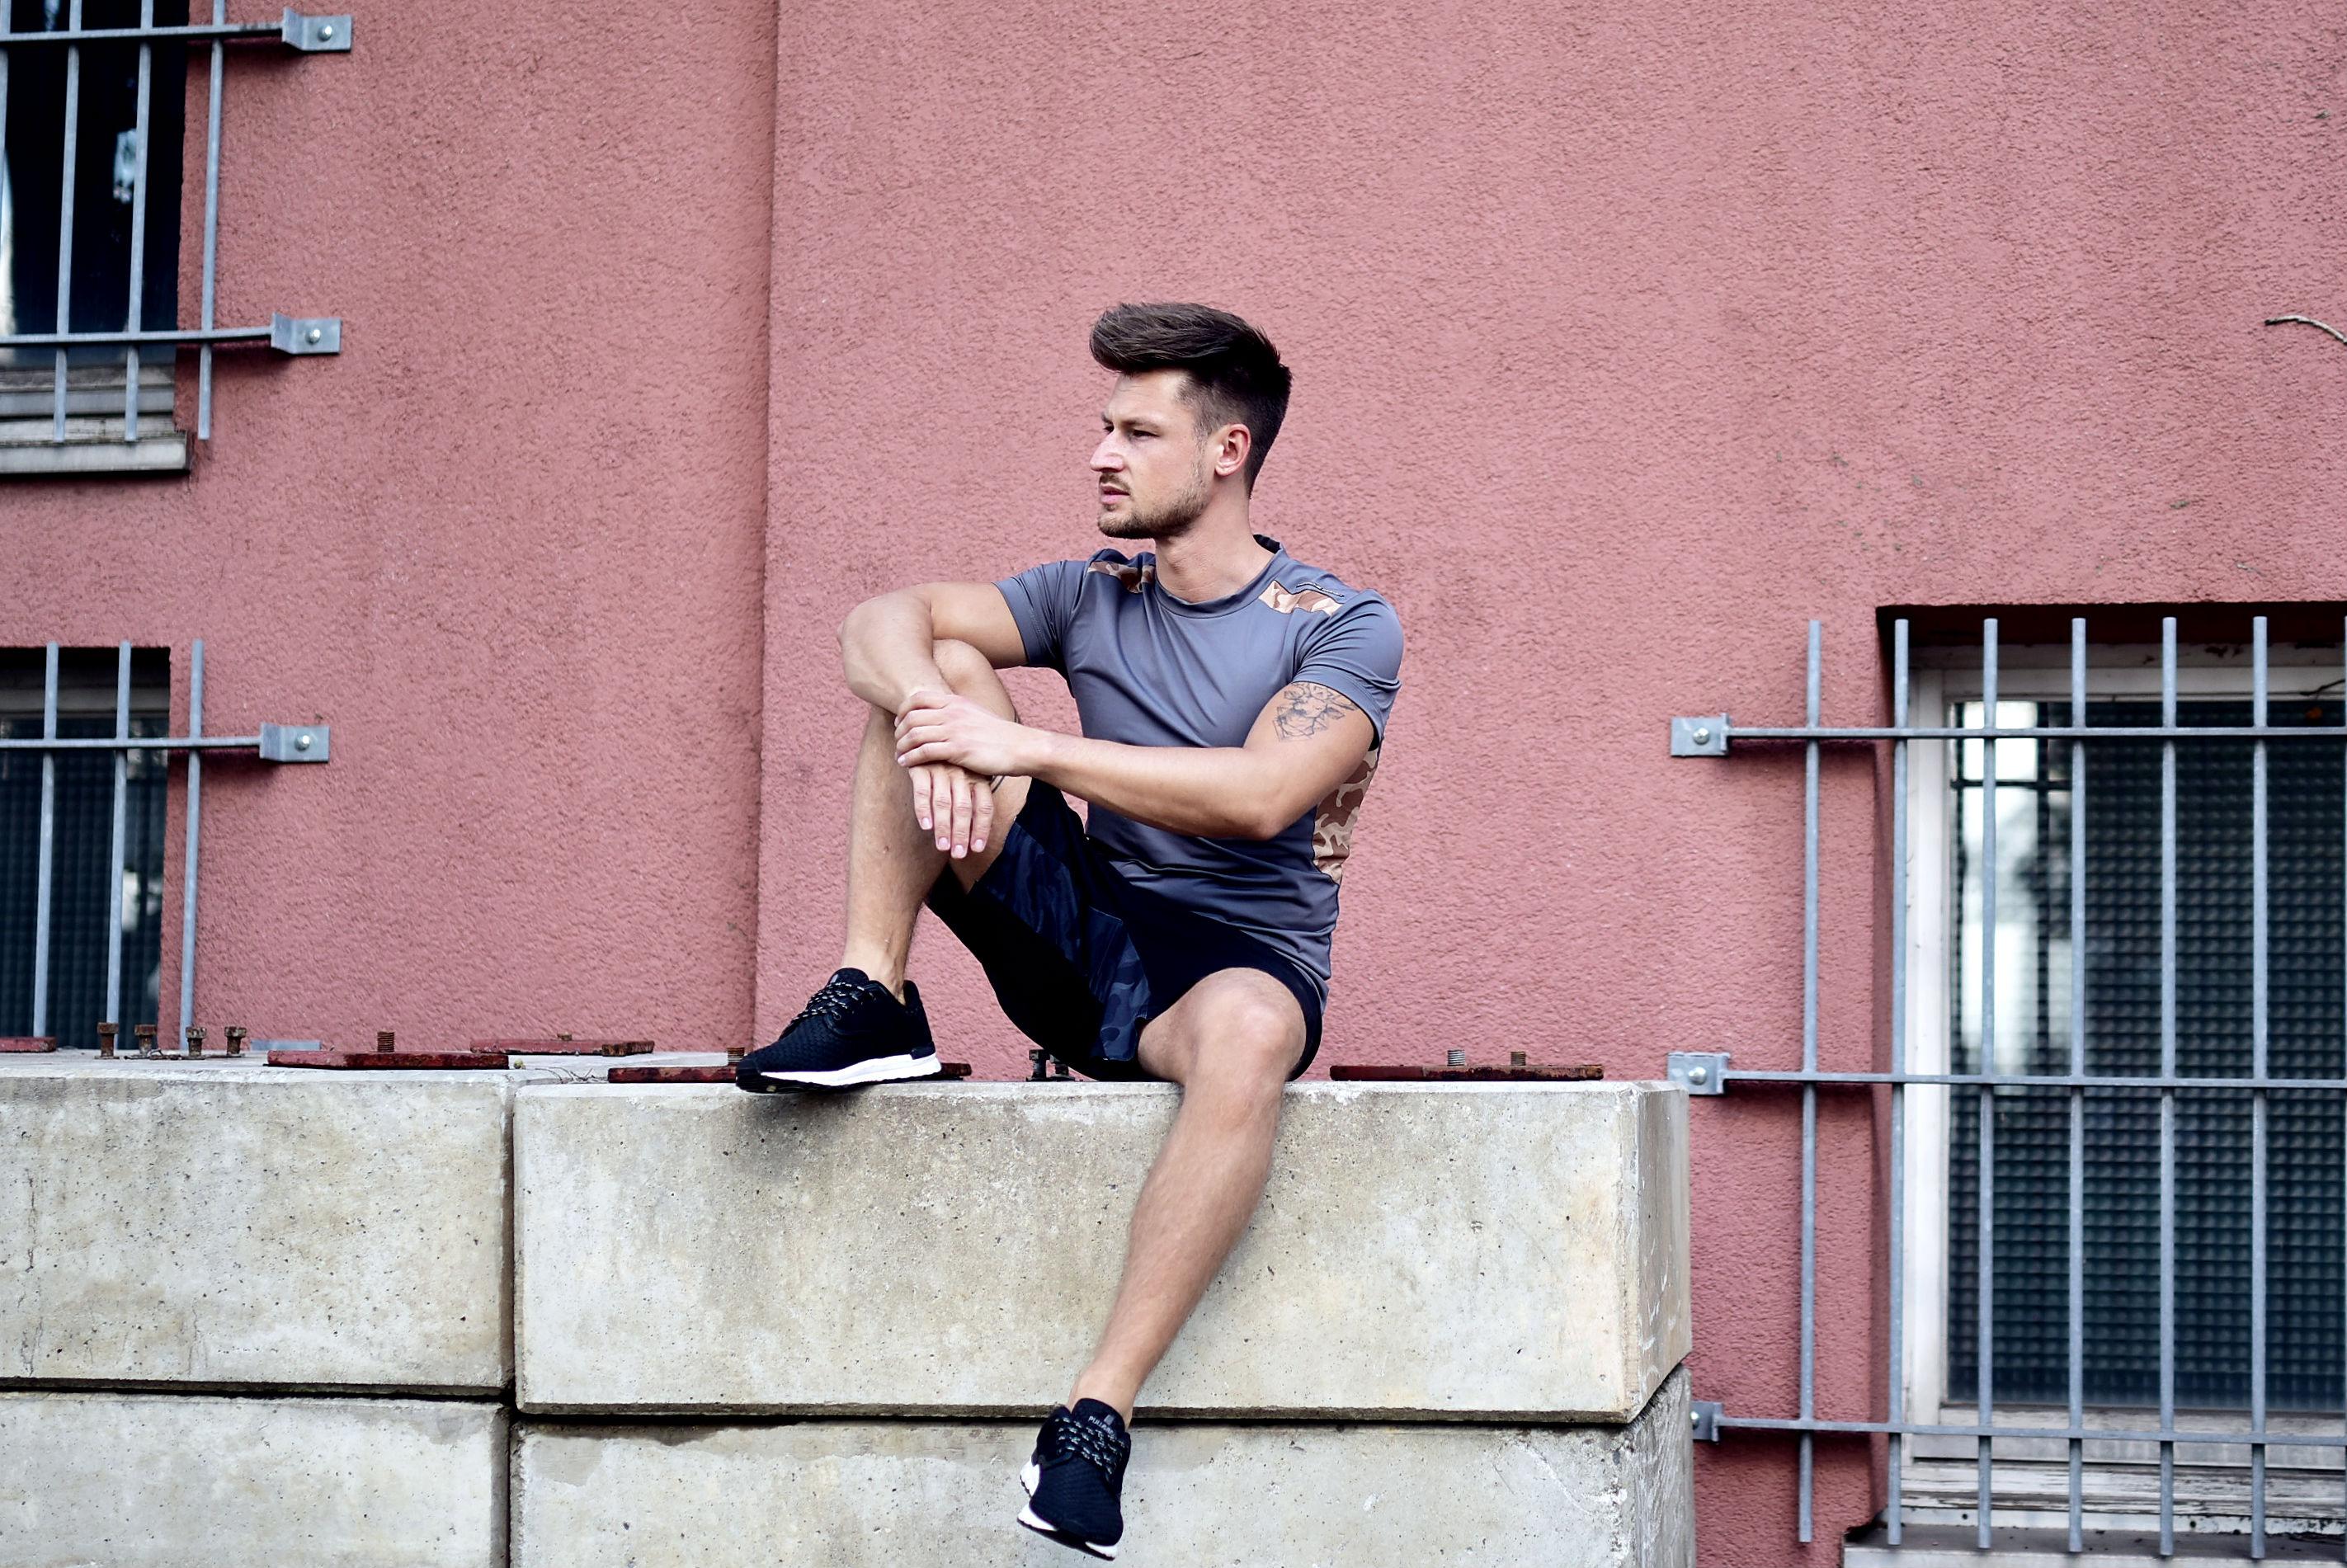 Tommeezjerry-Styleblog-Männerblog-Männer-Modeblog-Berlin-Berlinblog-Männermodeblog-Outfit-Sportoutfit-Adidas-Porsche-Design-Fitness-Look-Sportswear